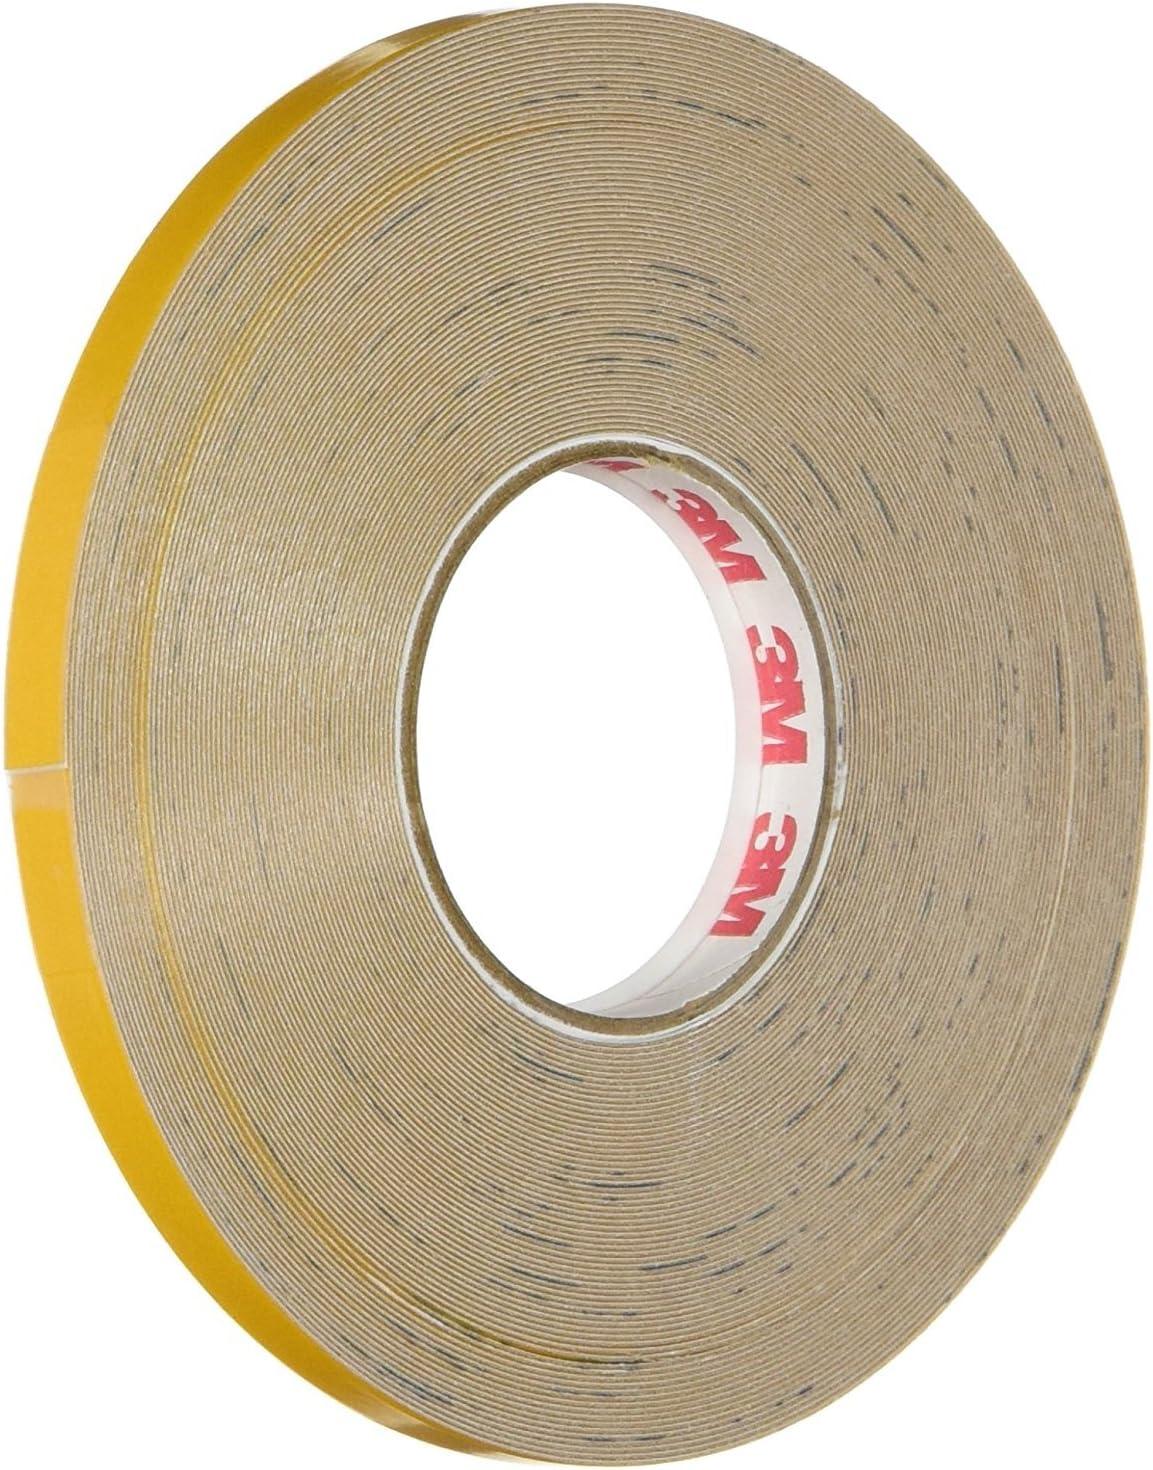 New popularity 3M 150FT Reflective Body Stripe Tape Adhe DIY Sticker Soldering Decal Self